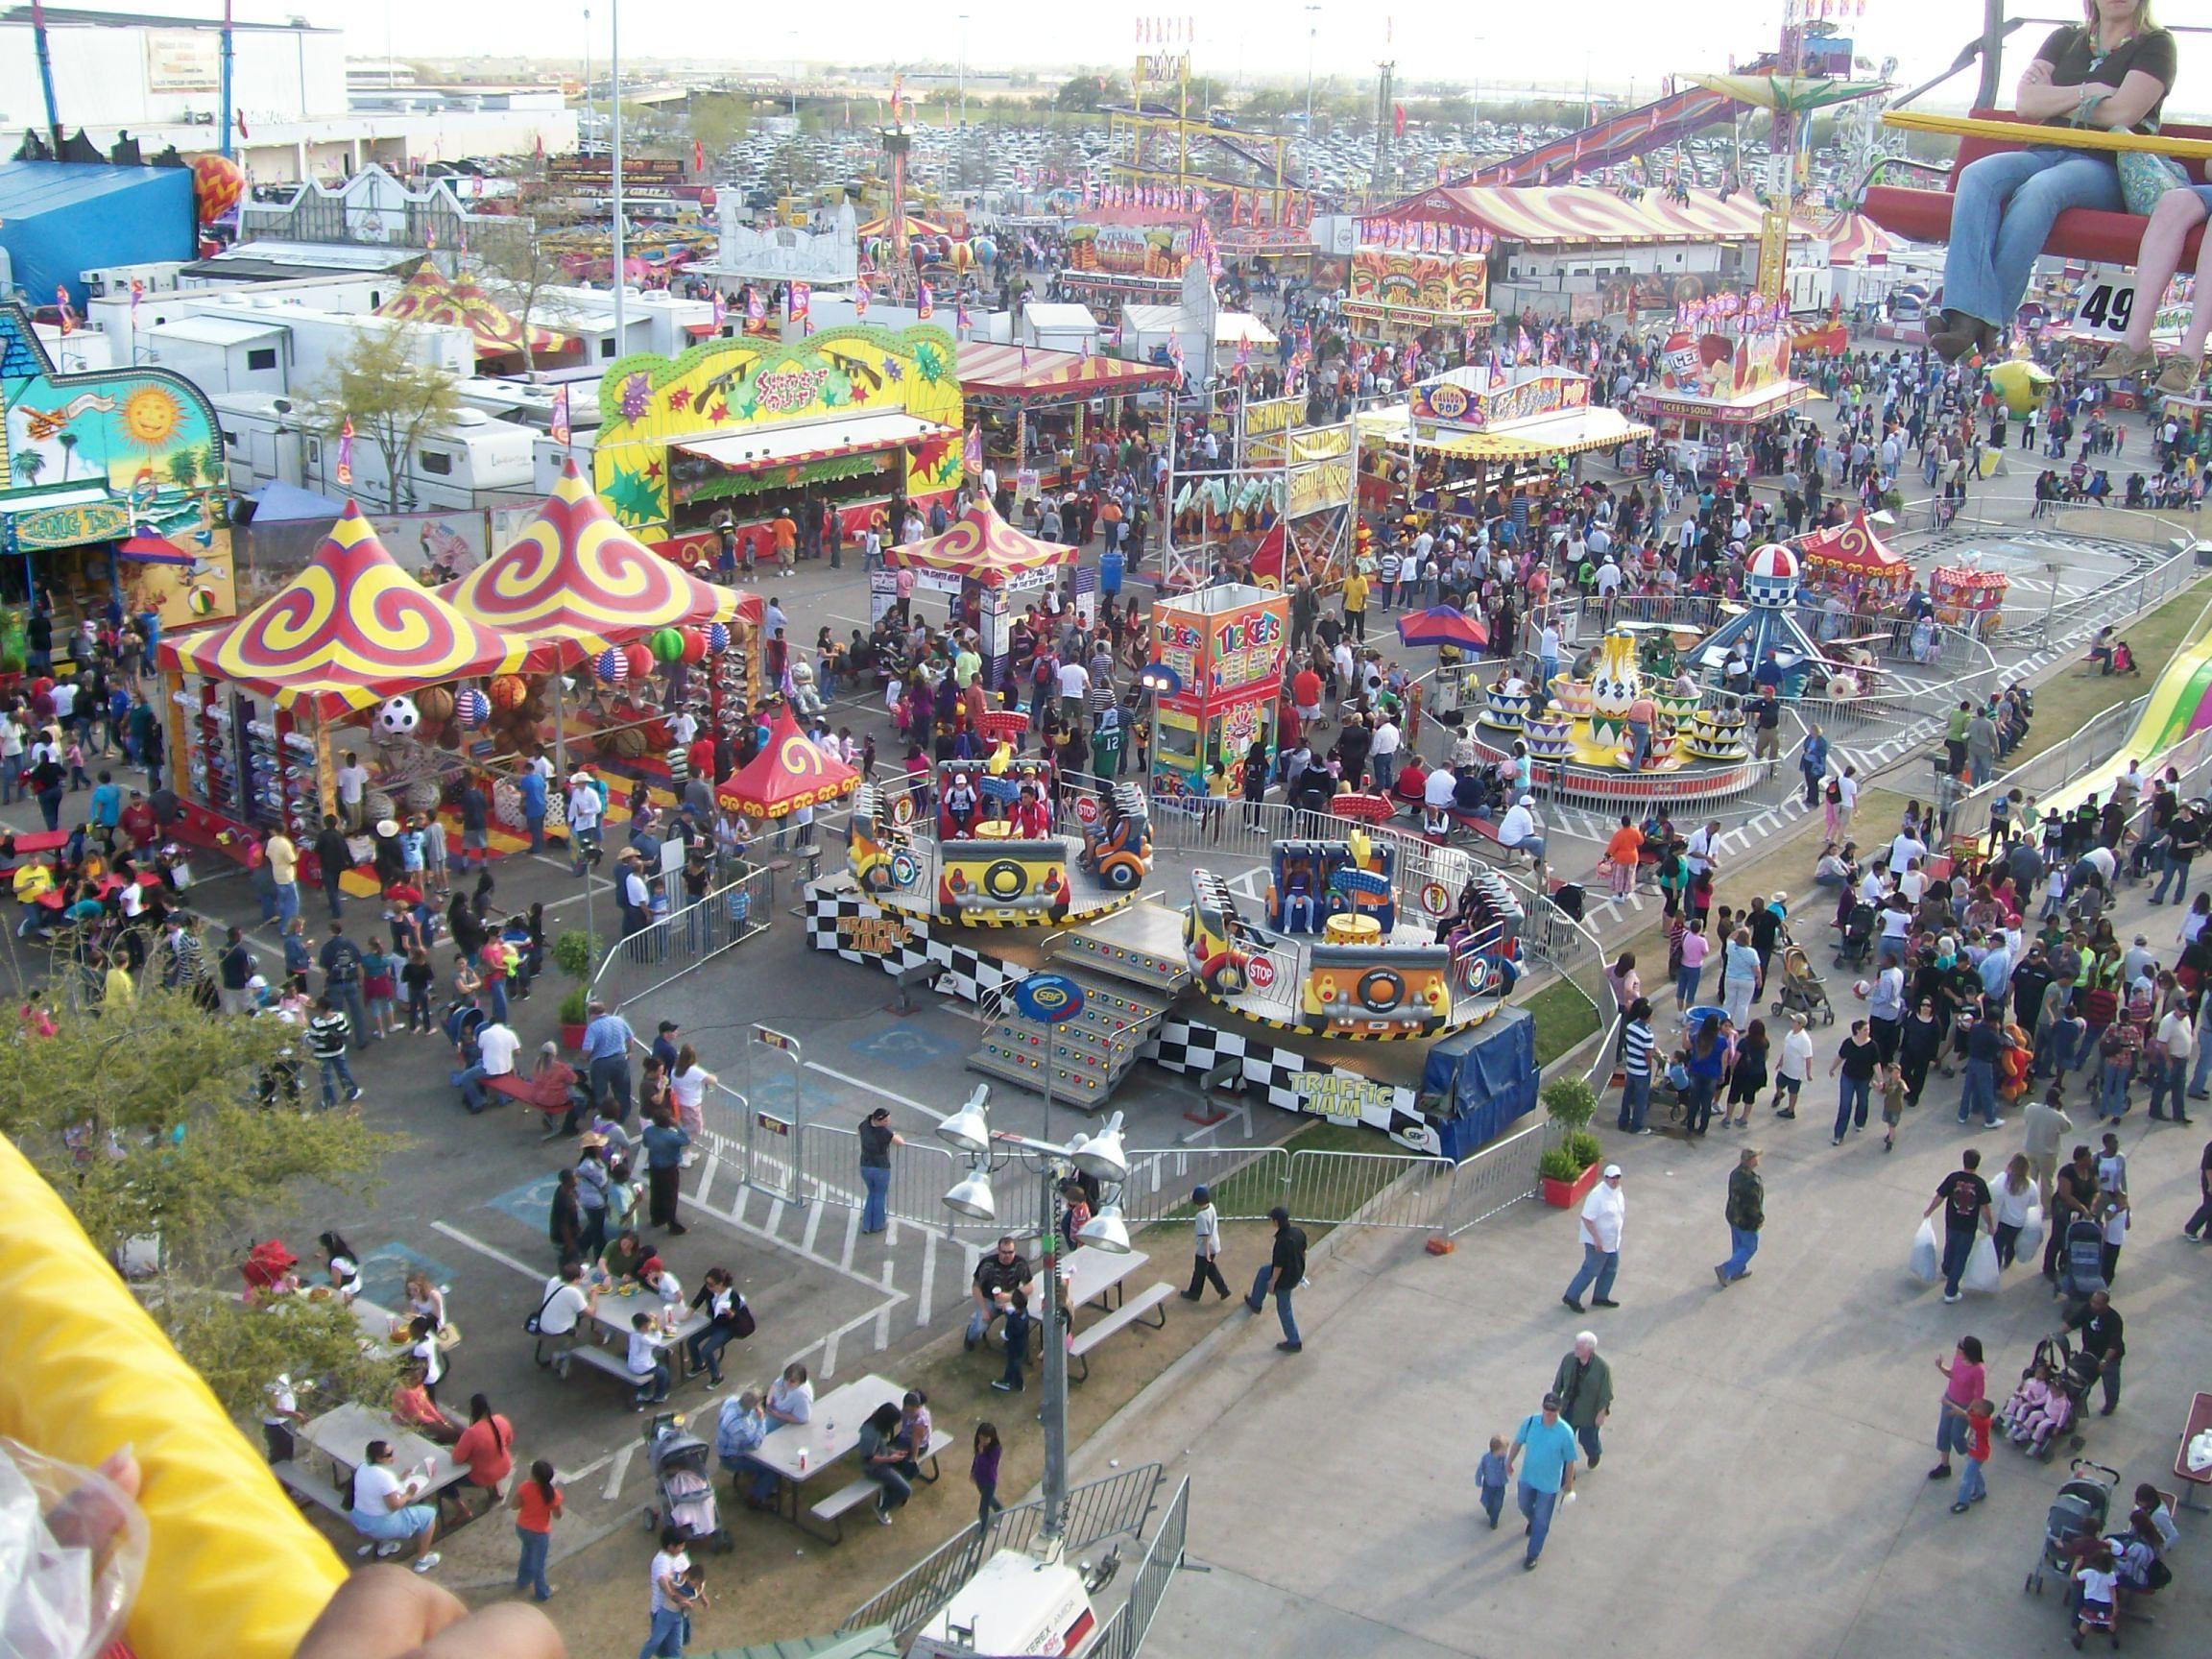 Annual Houston Livestock Amp Rodeo Carnival Reliant Stadium